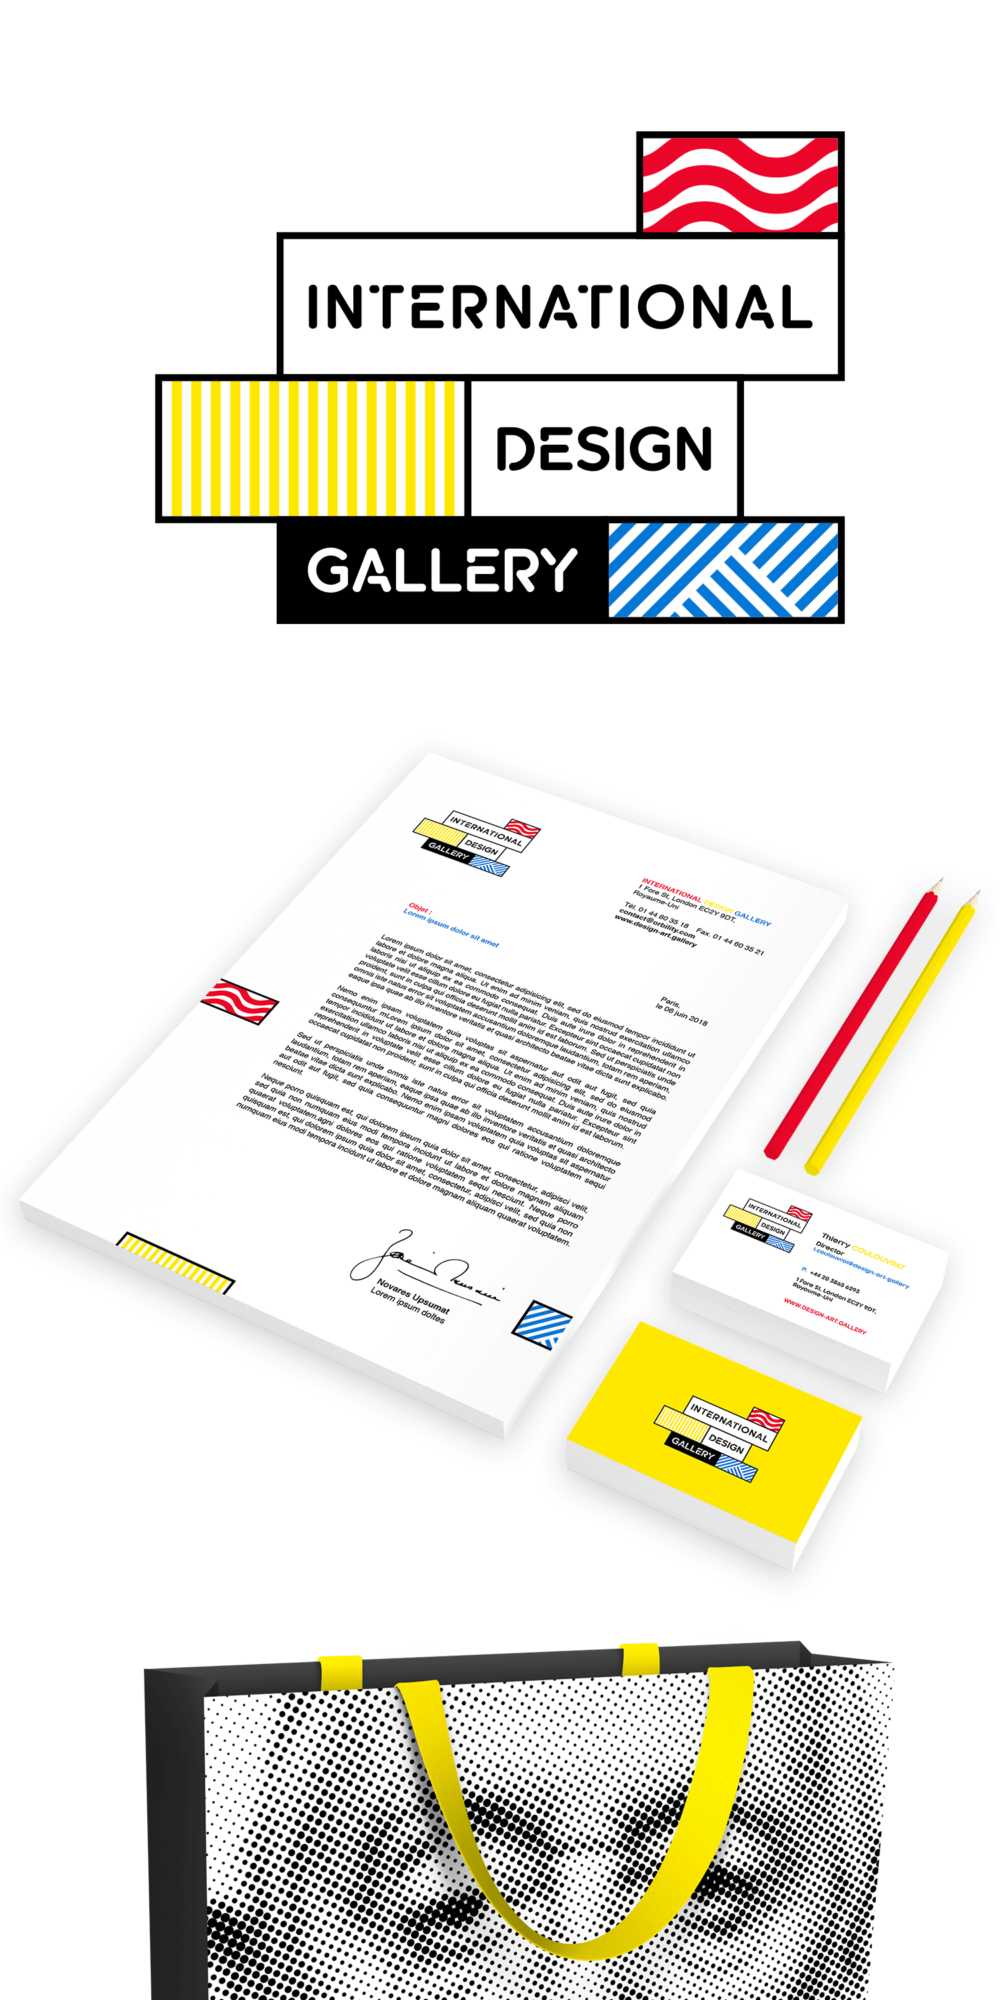 Identité visuelle de International Design Gallery